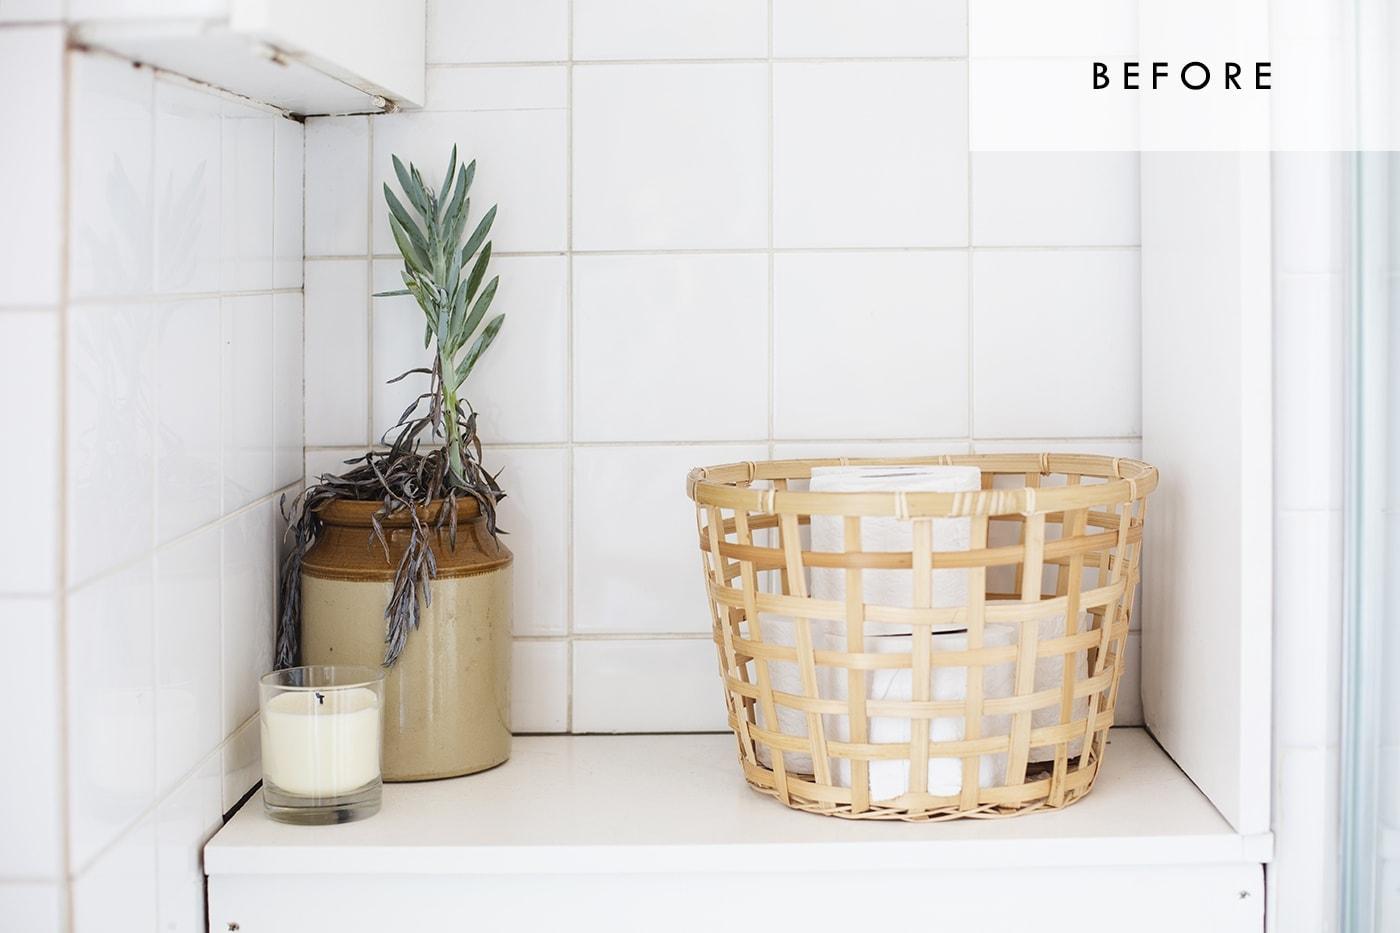 Bathroom refresh with Habitat | before 4